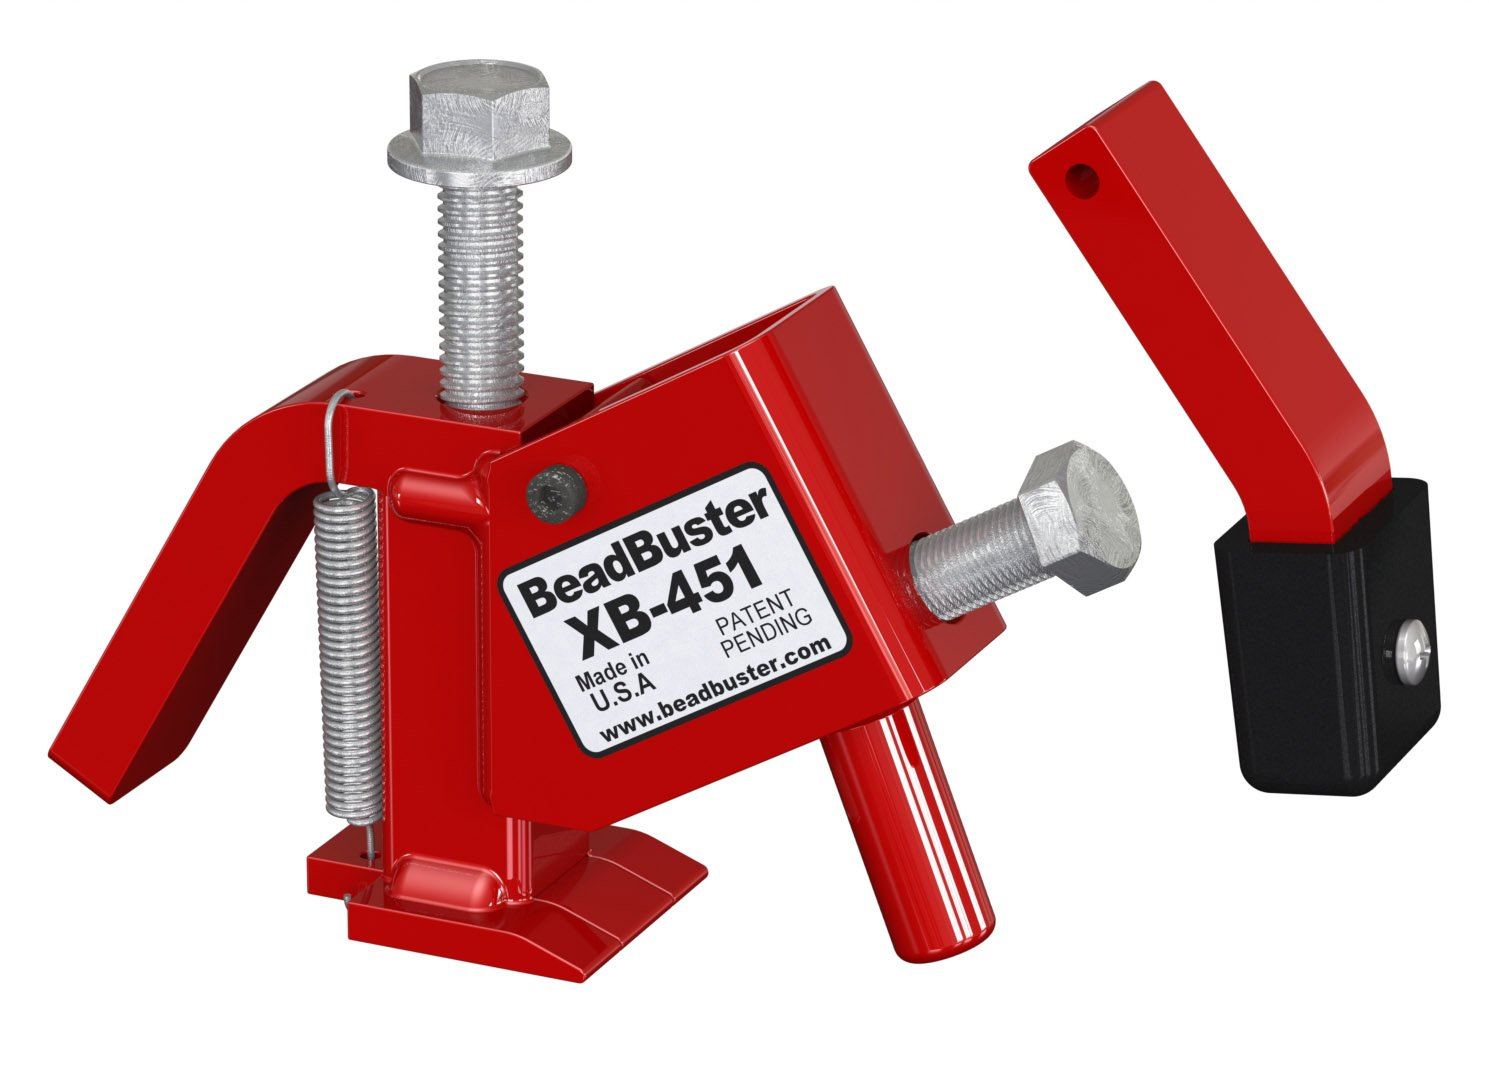 BeadBuster XB-451 ATV (Reinforced Rims) / Motorcycle / Car Tire Bead Breaker Tool